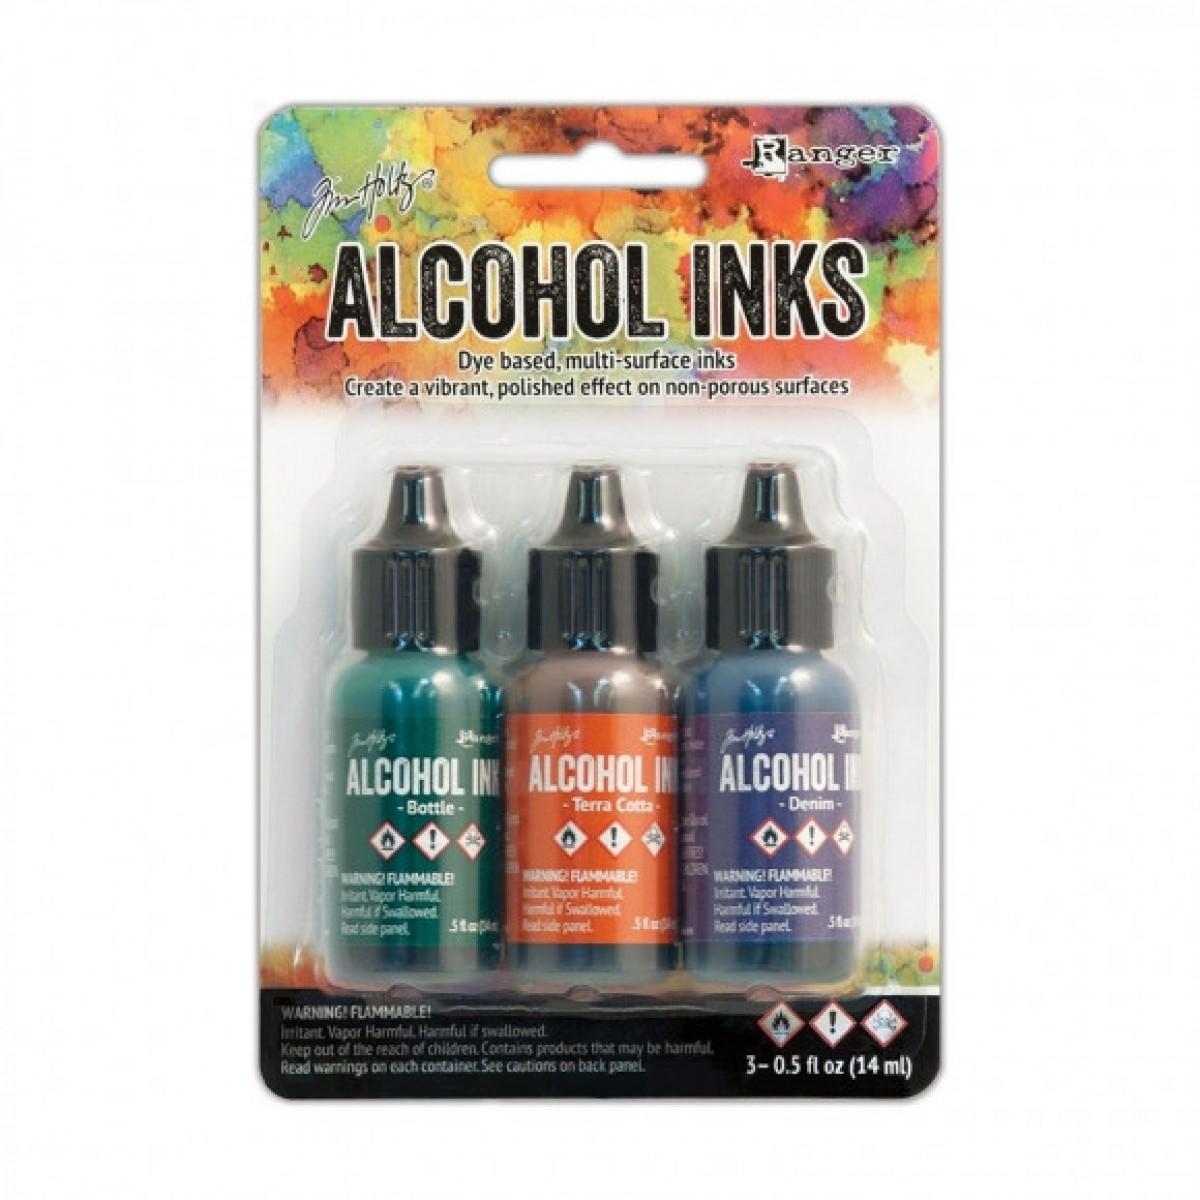 Ranger Alkohol ink Kit, 3 stk., Rustic Lodge. FAST LAVPRIS